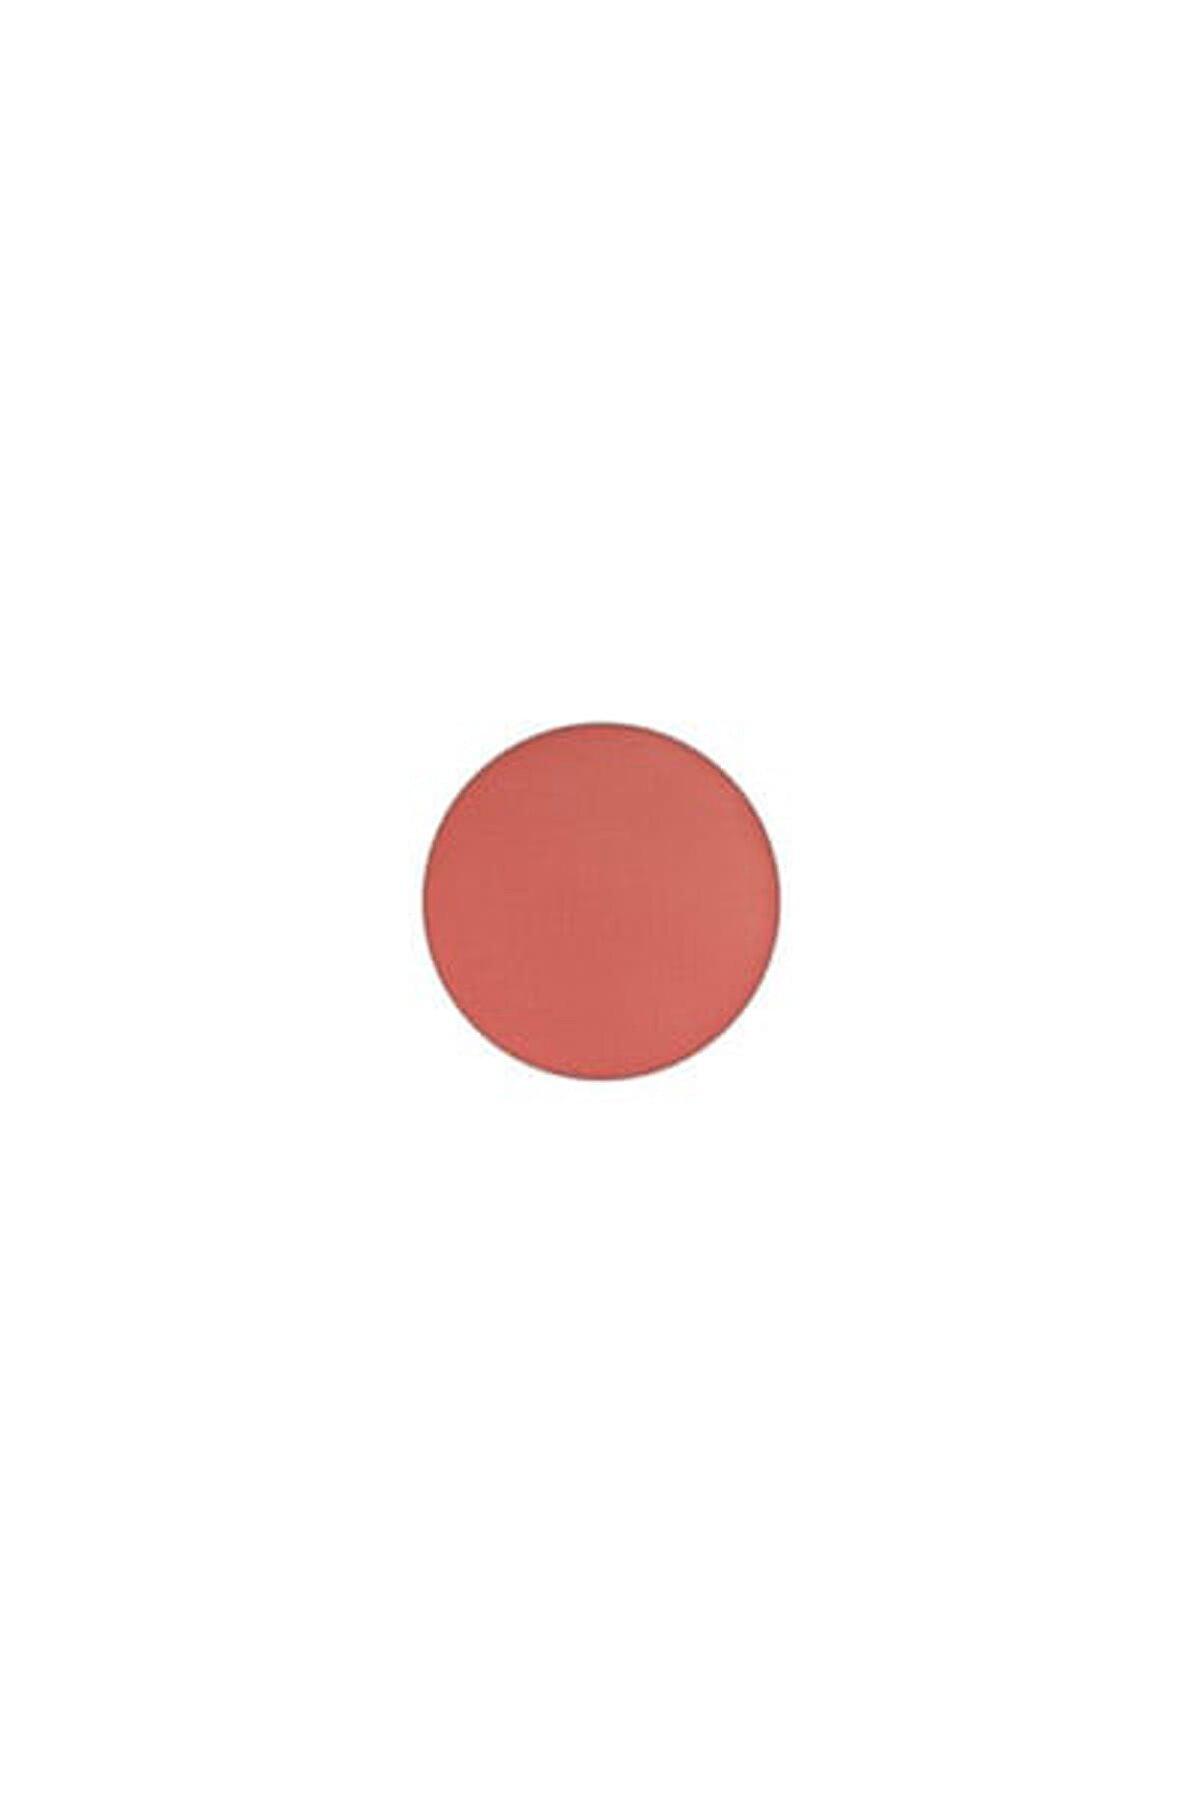 Mac Refill Allık - Powder Blush Pro Palette Refill Pan Burnt Pepper 6 g 773602358175